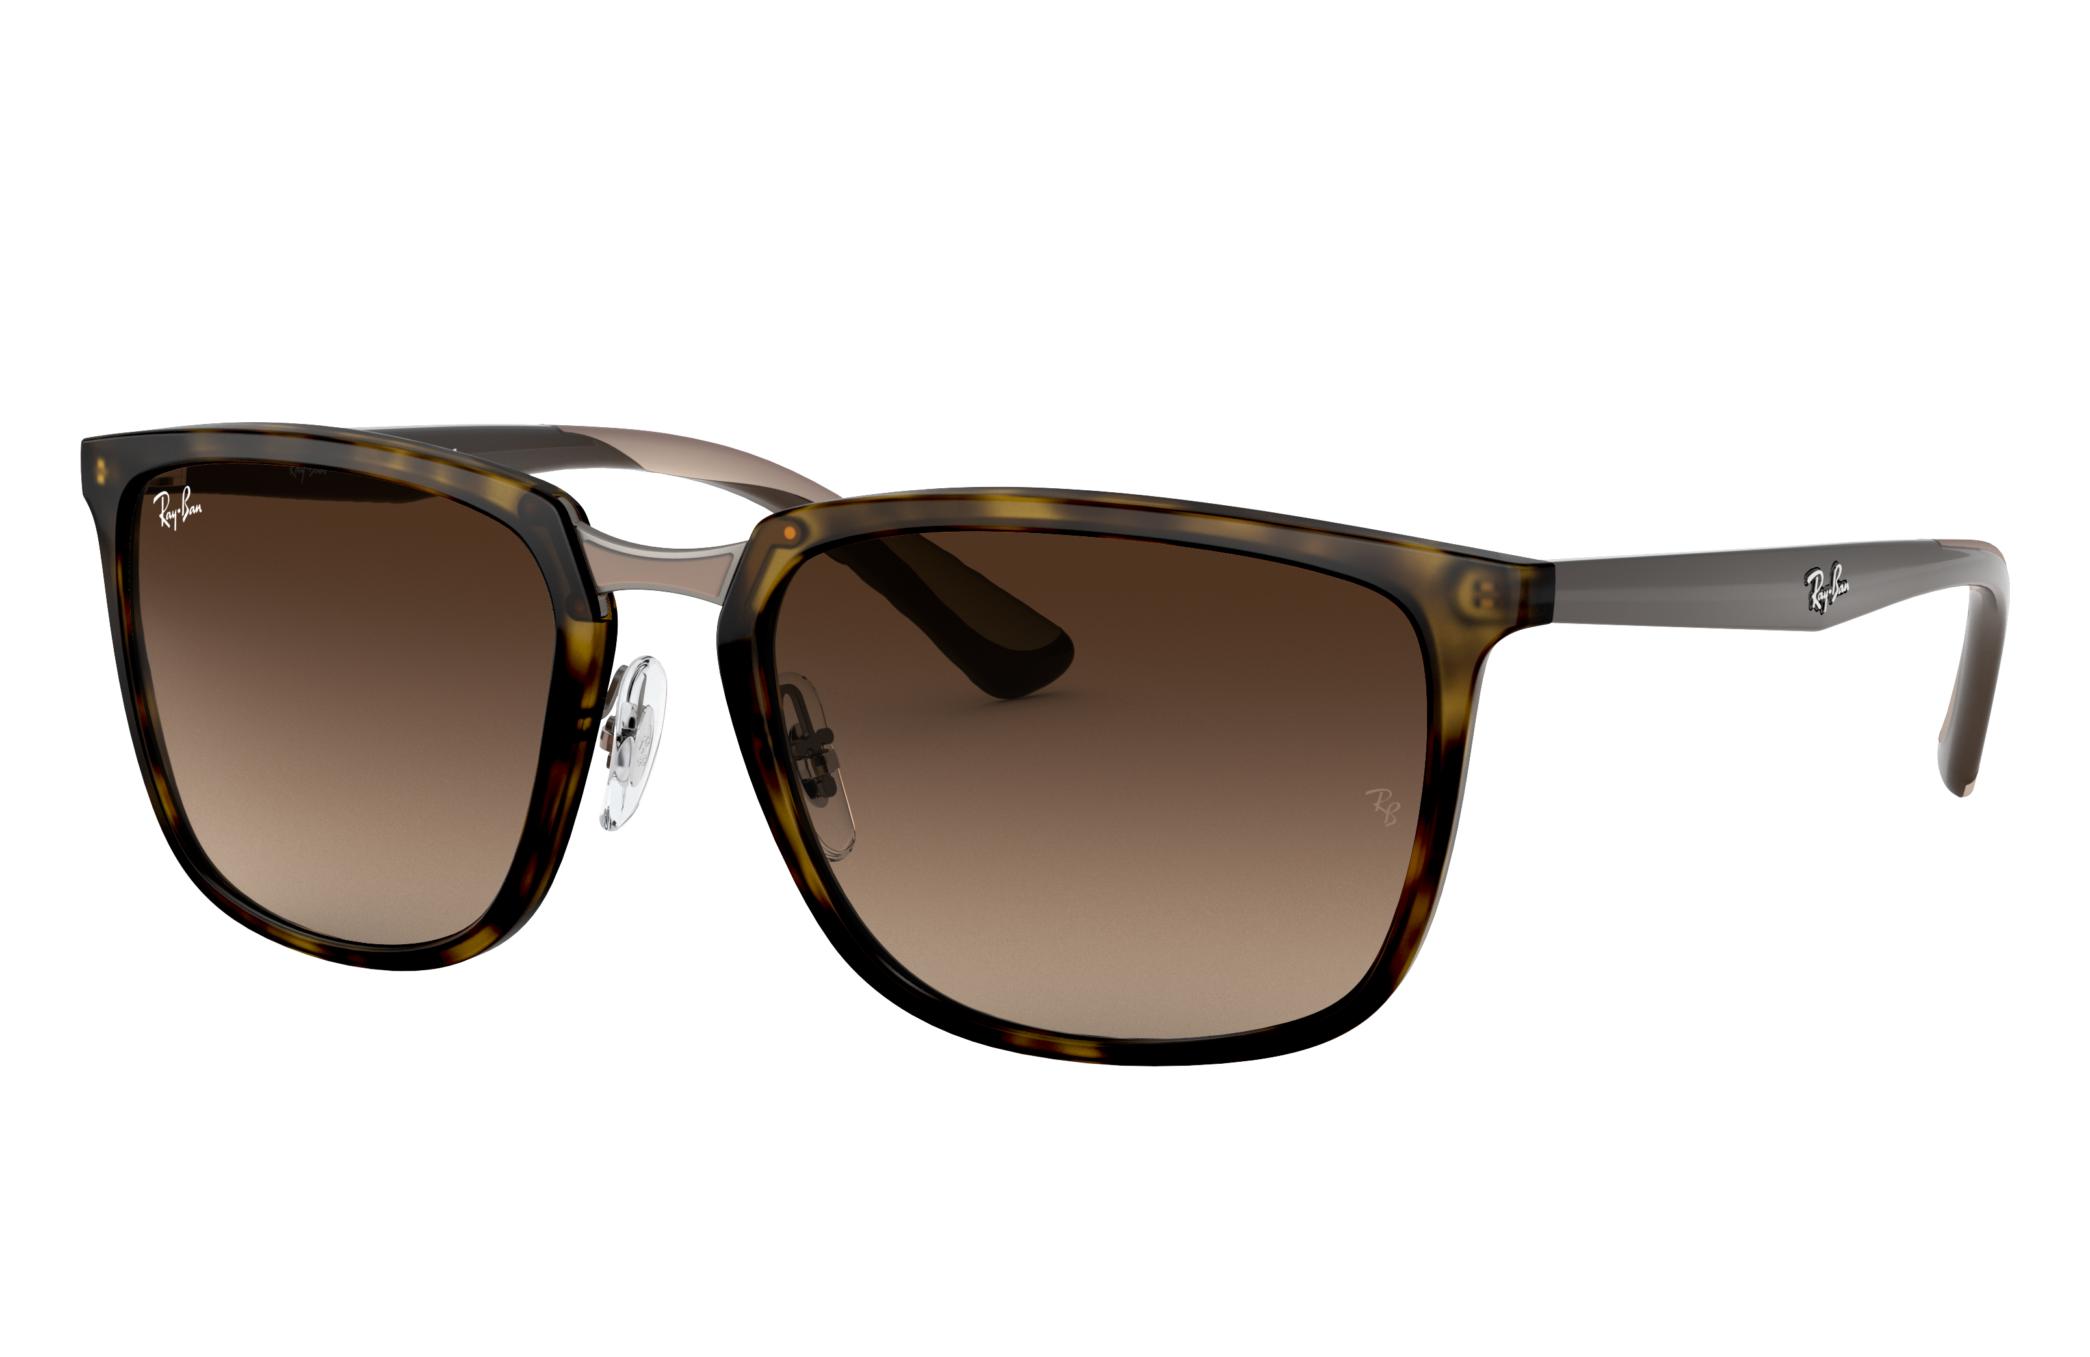 Ray-Ban Rb4303 Black, Brown Lenses - RB4303